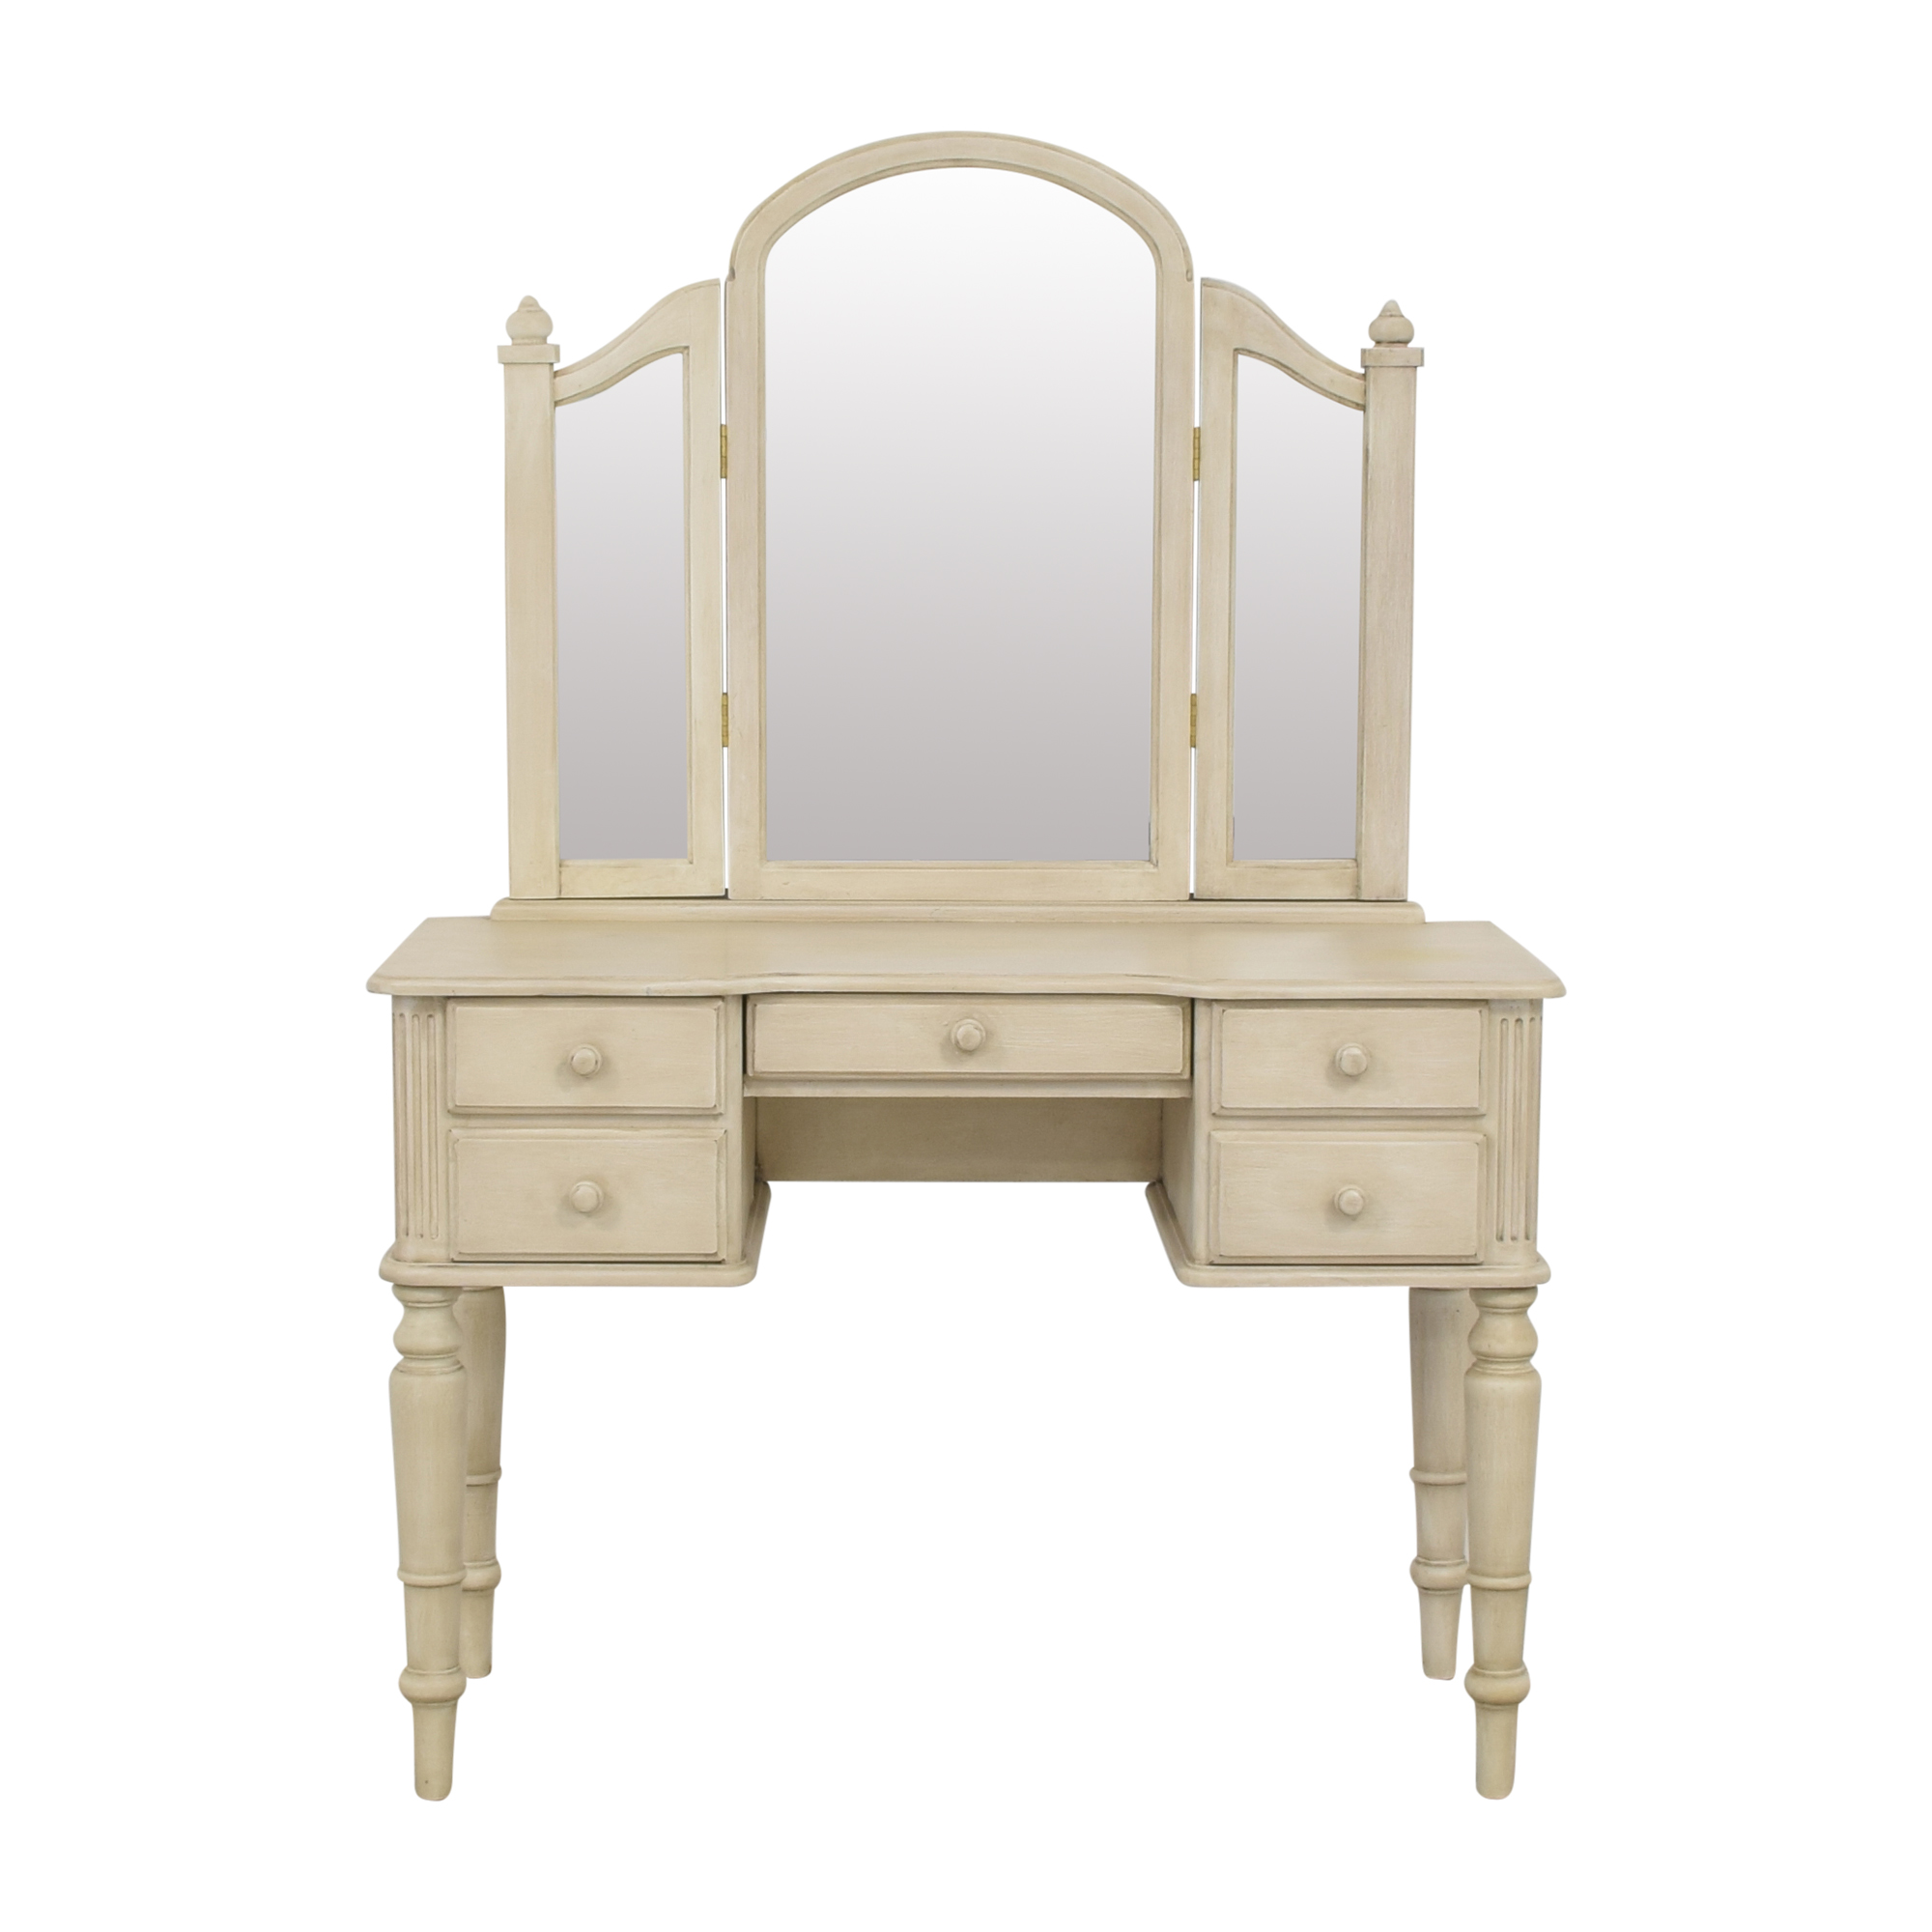 Ethan Allen Ethan Allen Vanity with Tri-Fold Mirror ma